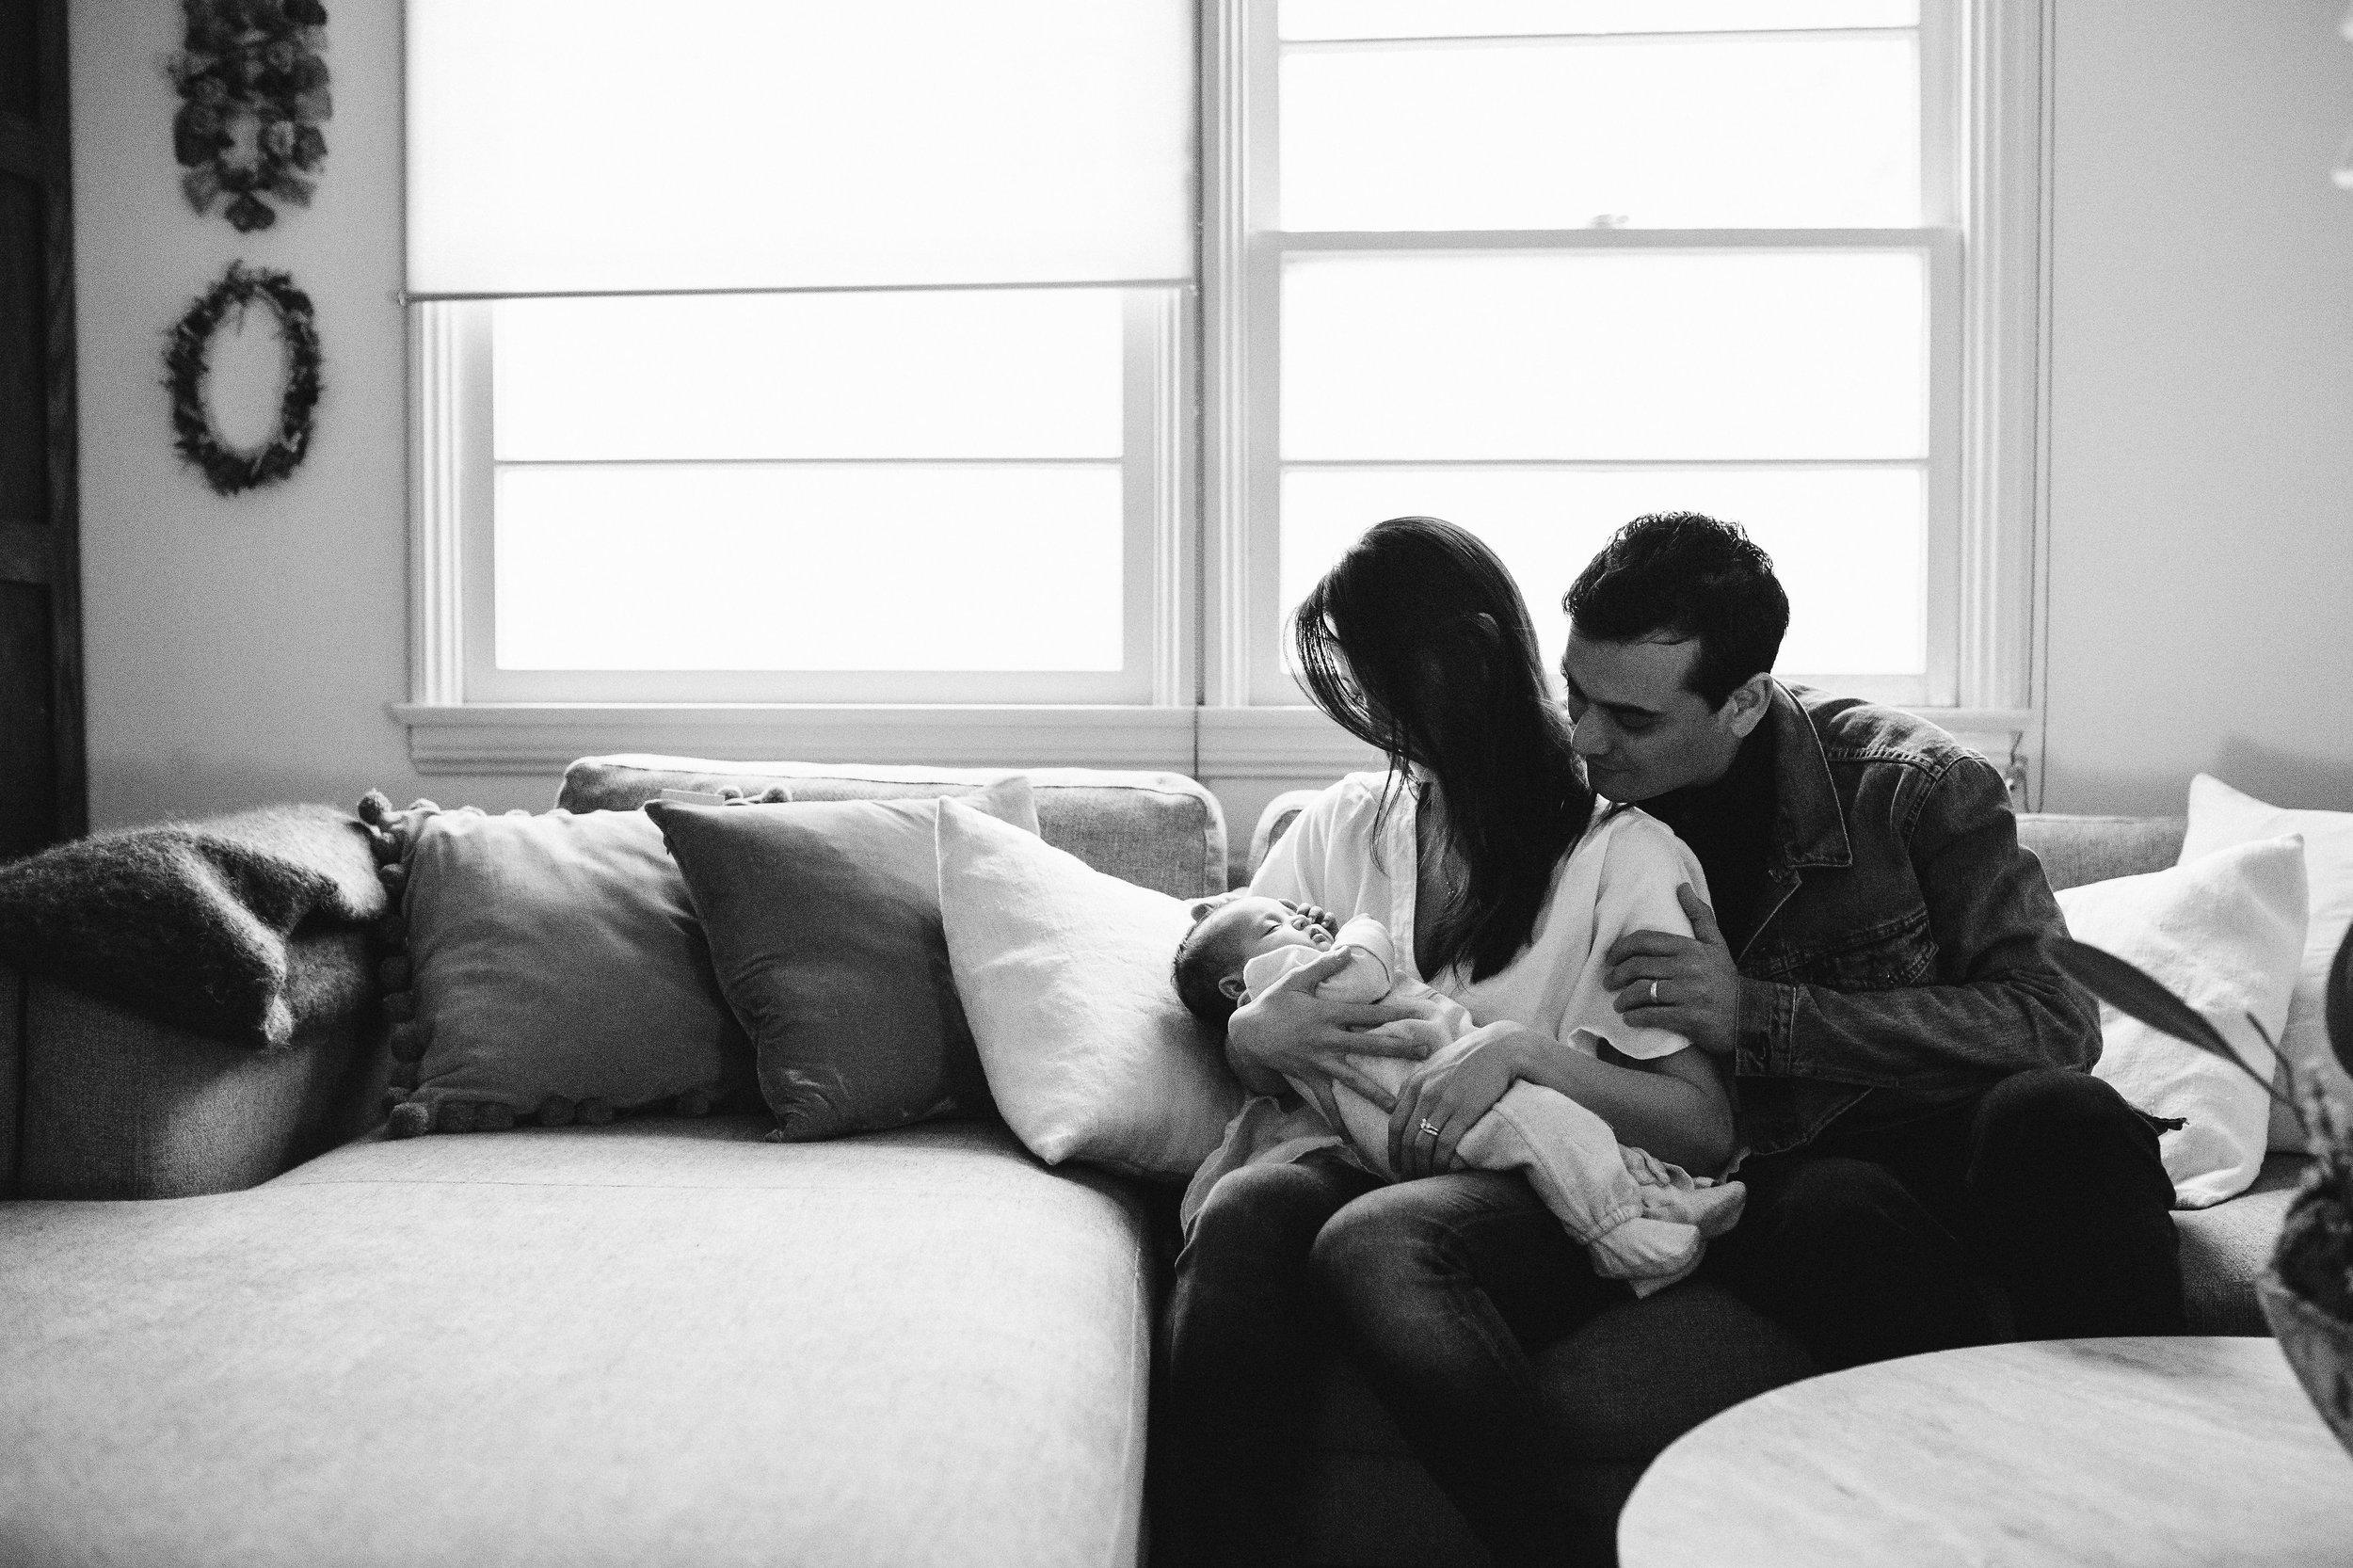 mehana-family-session_la-los-angeles-family-photographer-35-2.jpg